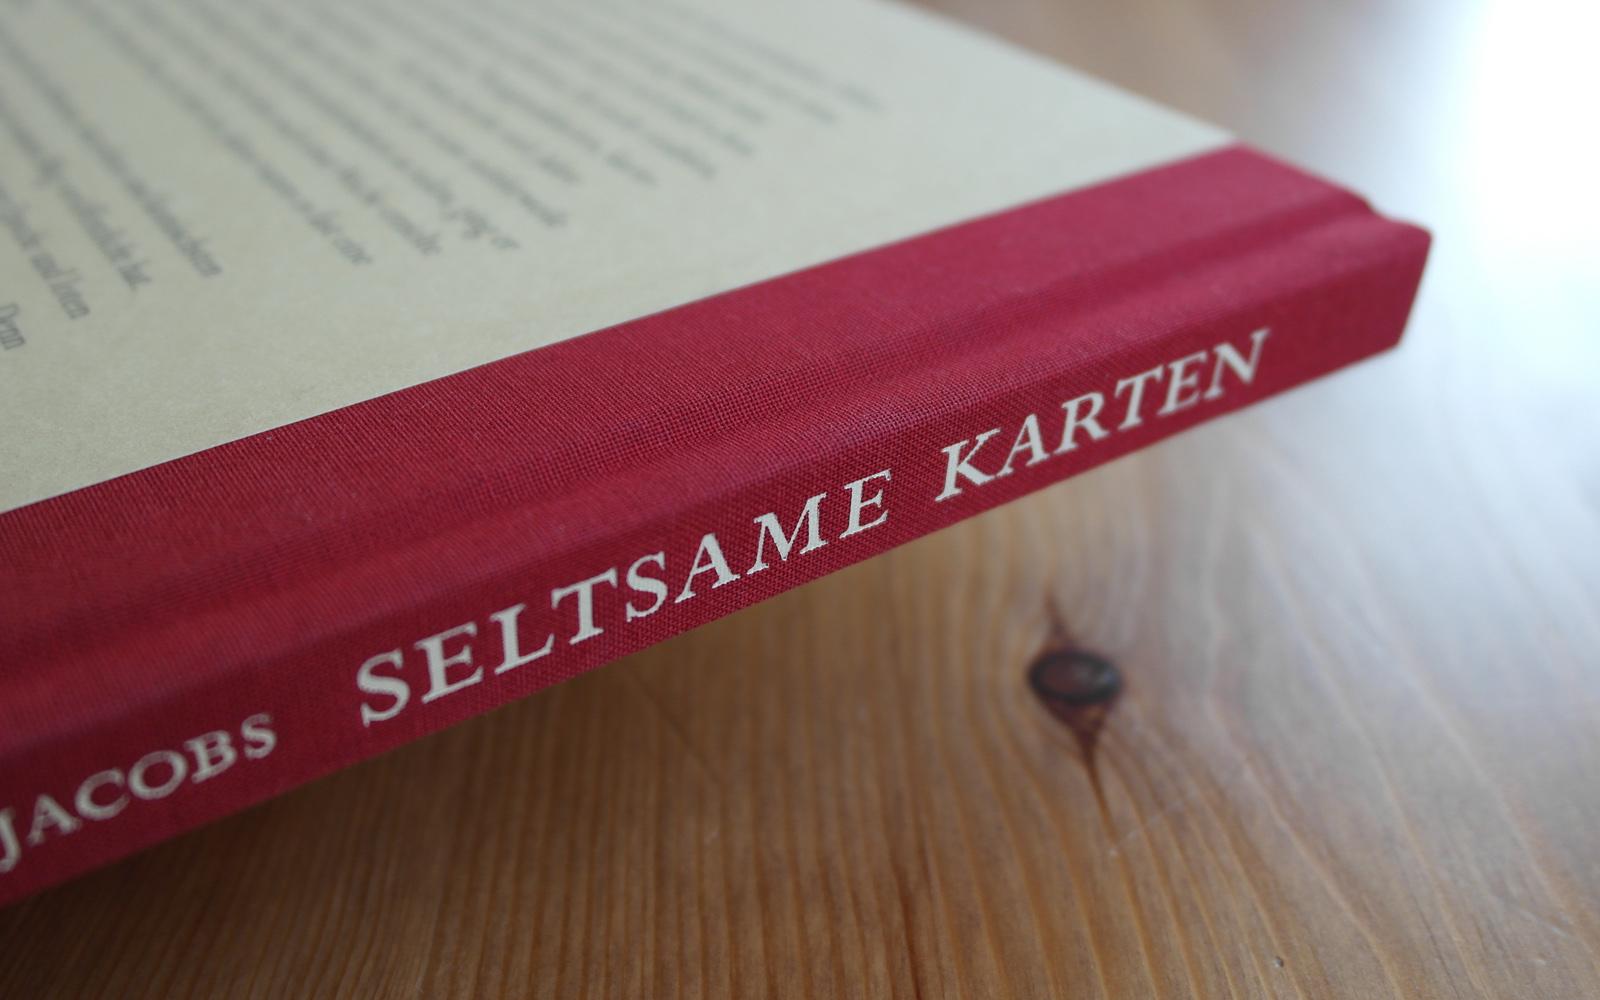 SeltSameKarten_03